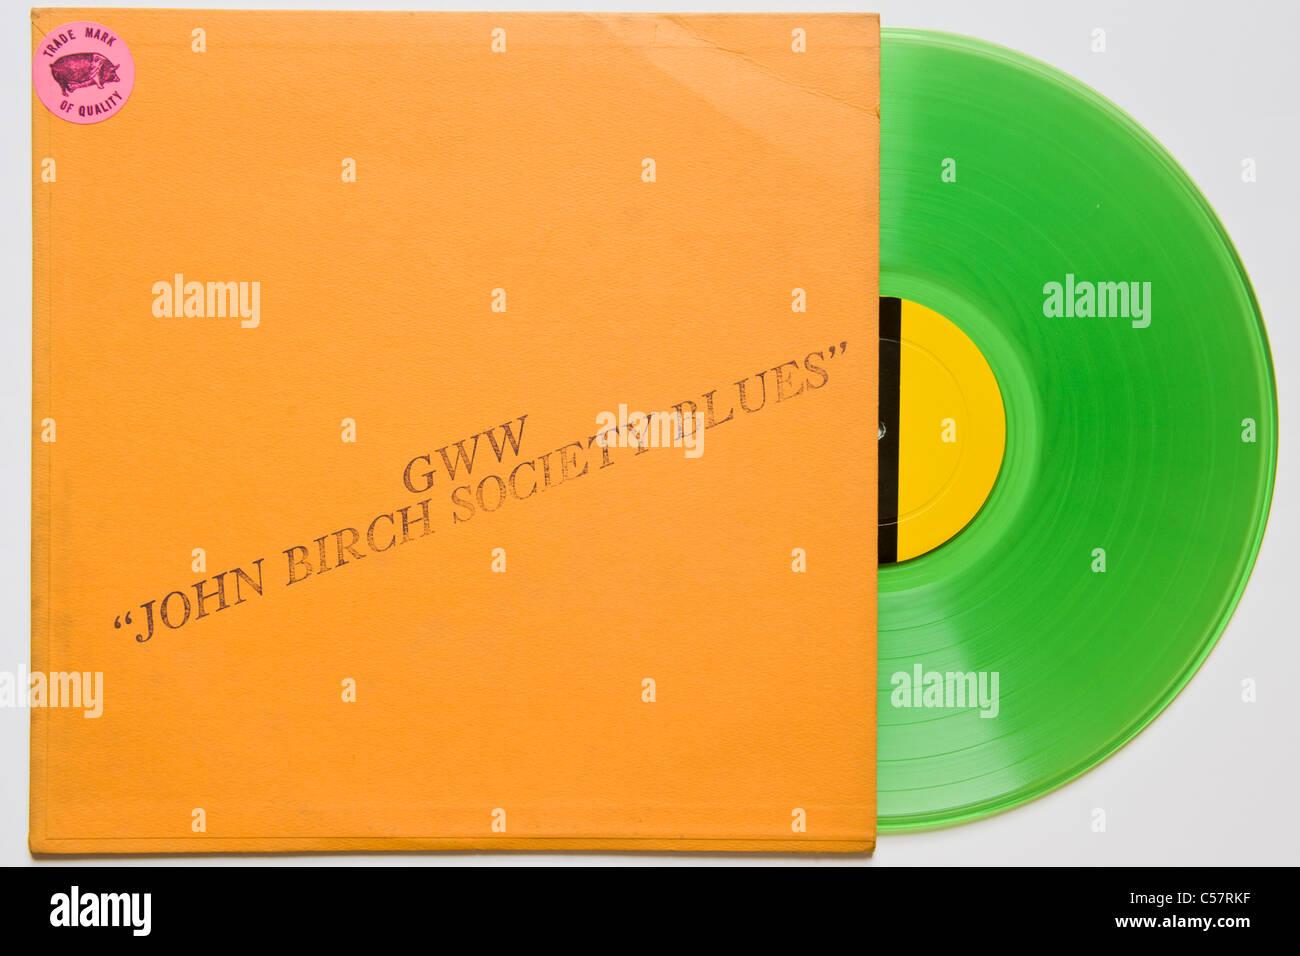 Original bootleg recording of John Birch Society Blues Bob Dylan 1961-64 released 1970 on green vinyl concert & Stock Photo